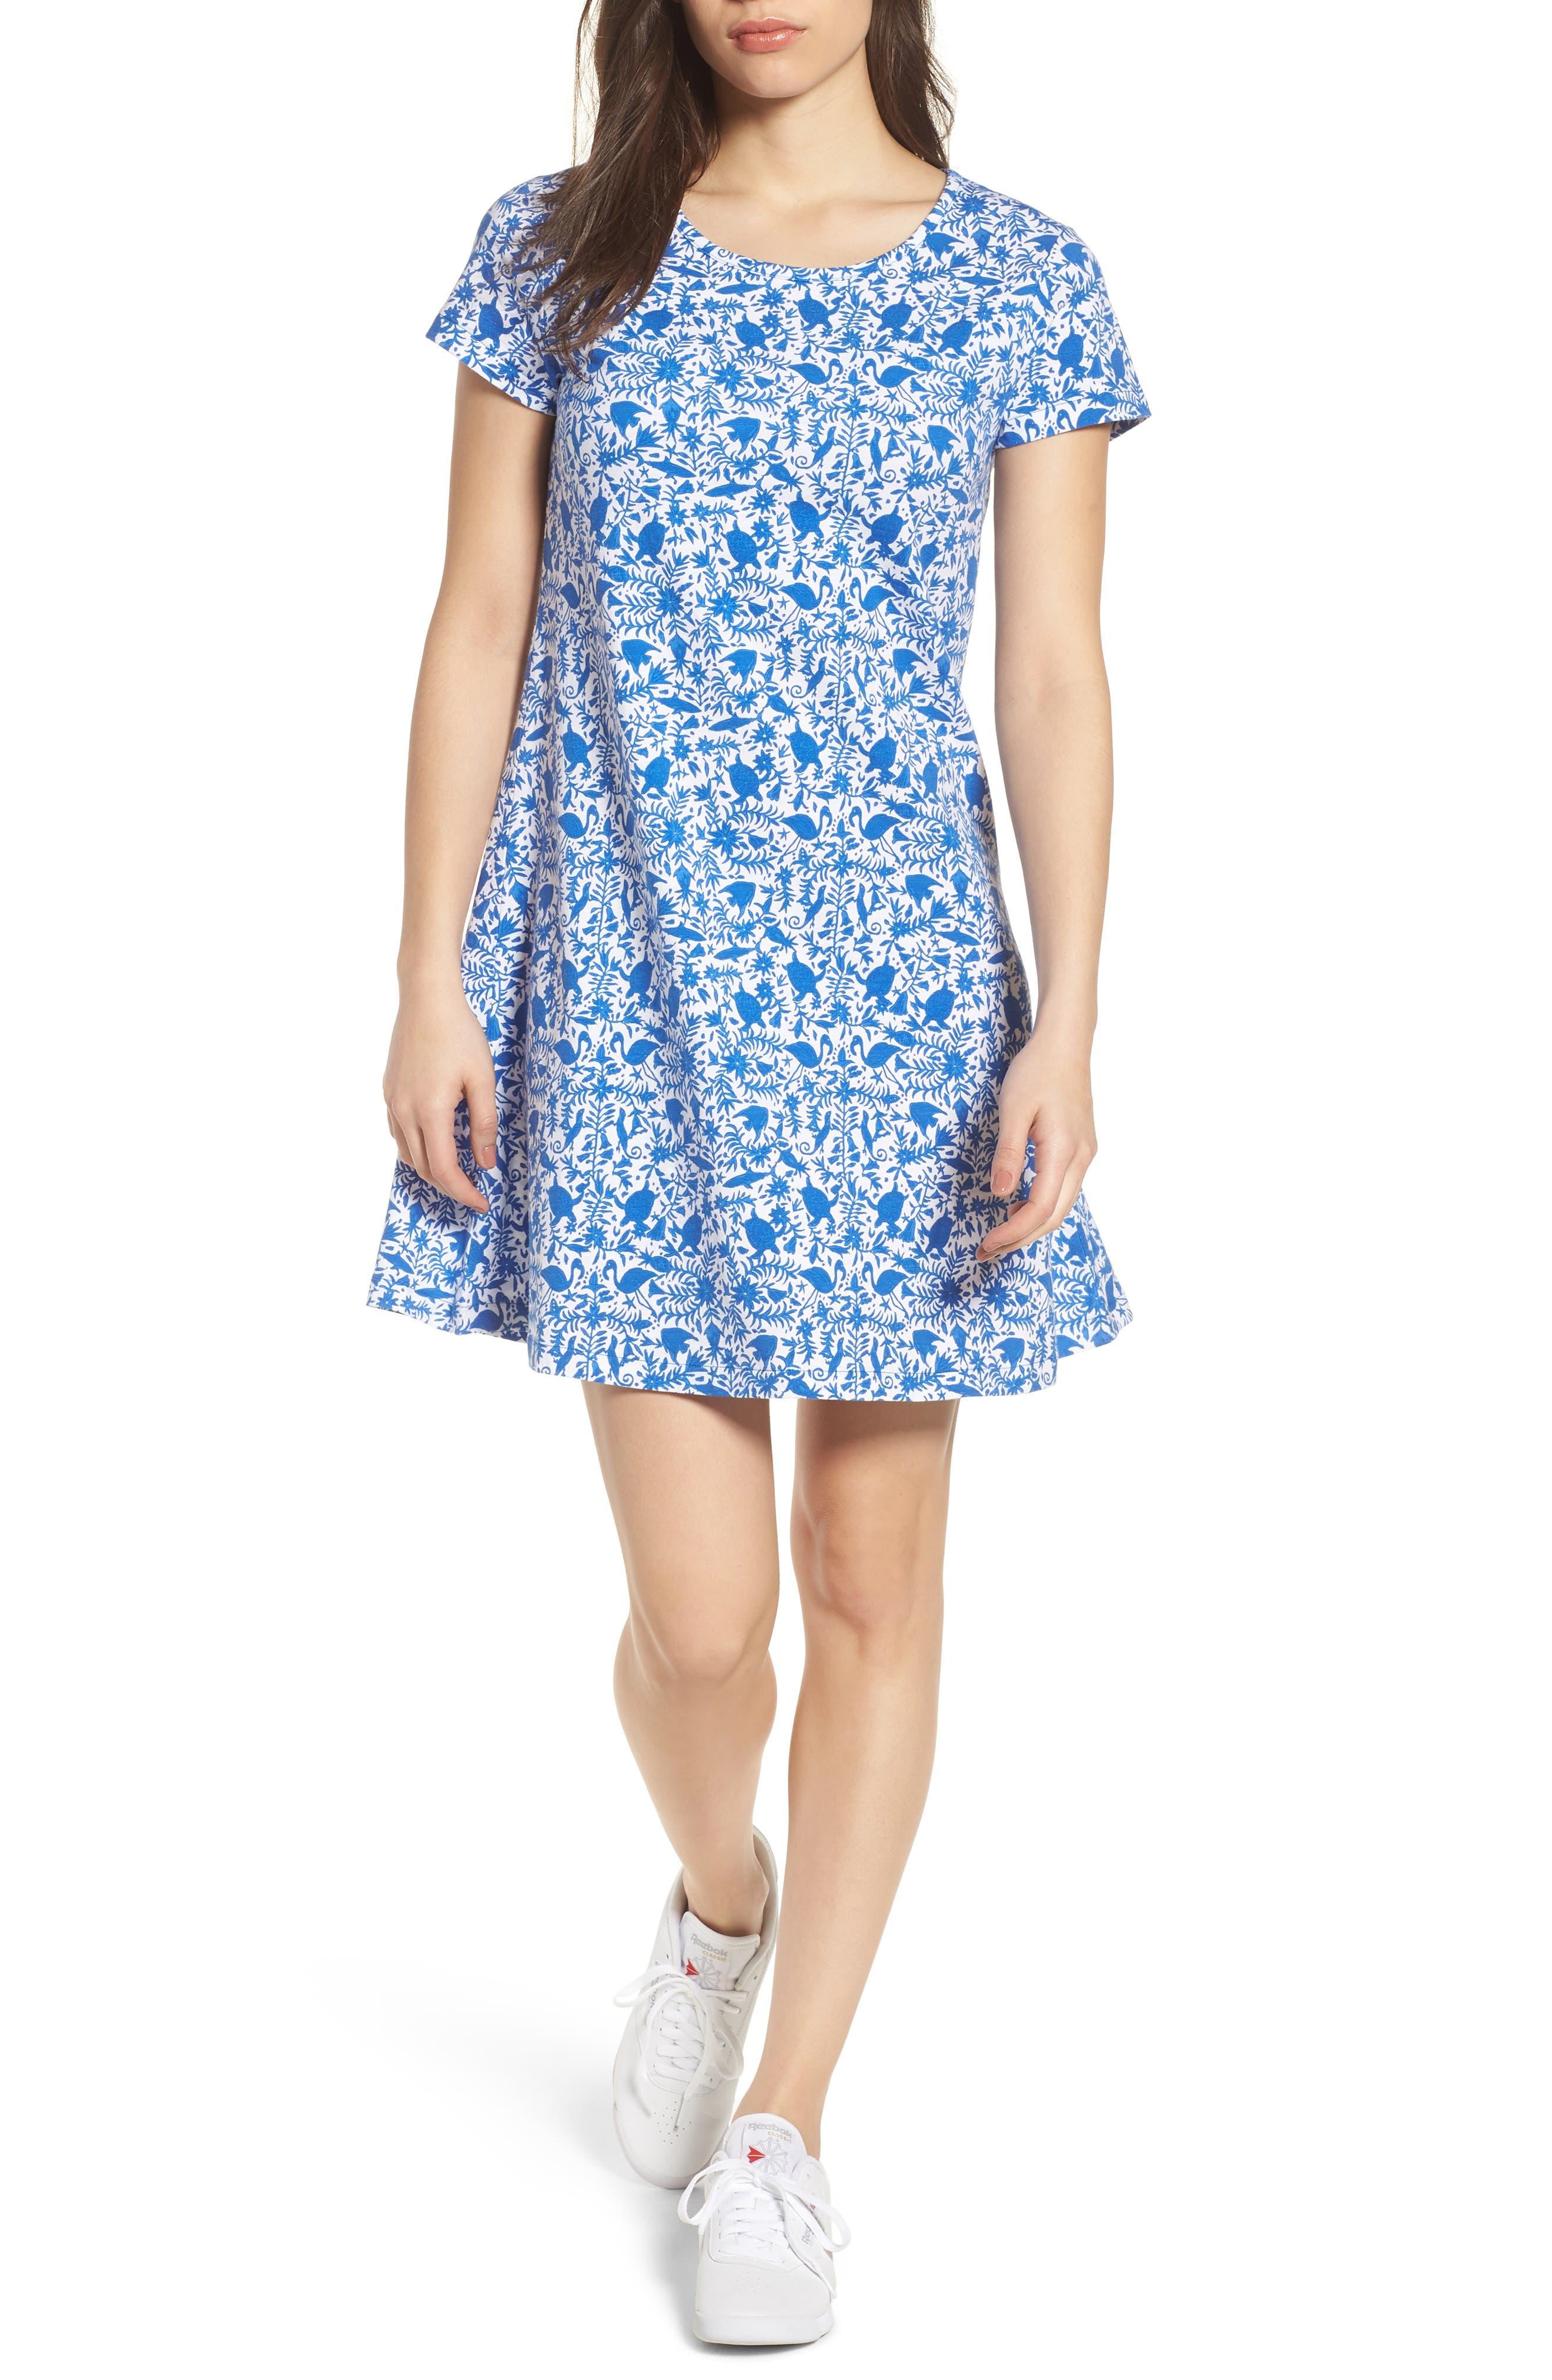 Bahamas Otomi Print Stretch Cotton Dress,                         Main,                         color, 413